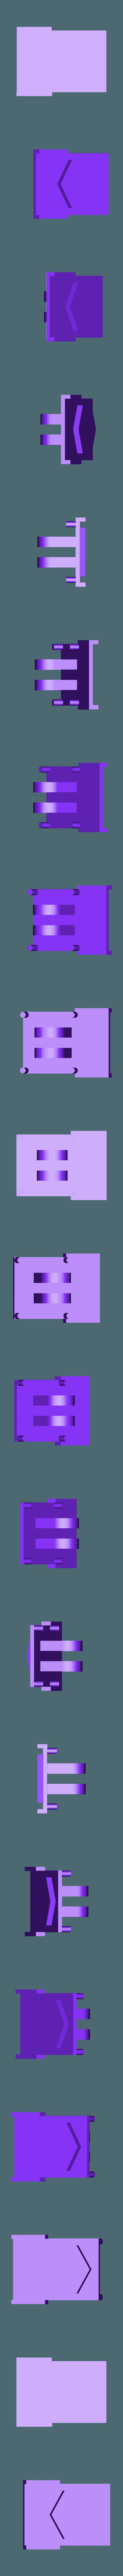 support_micrometre_fdbis.stl Download free STL file DE200 brackets micrometer parallelism head tray • 3D printable template, delmich